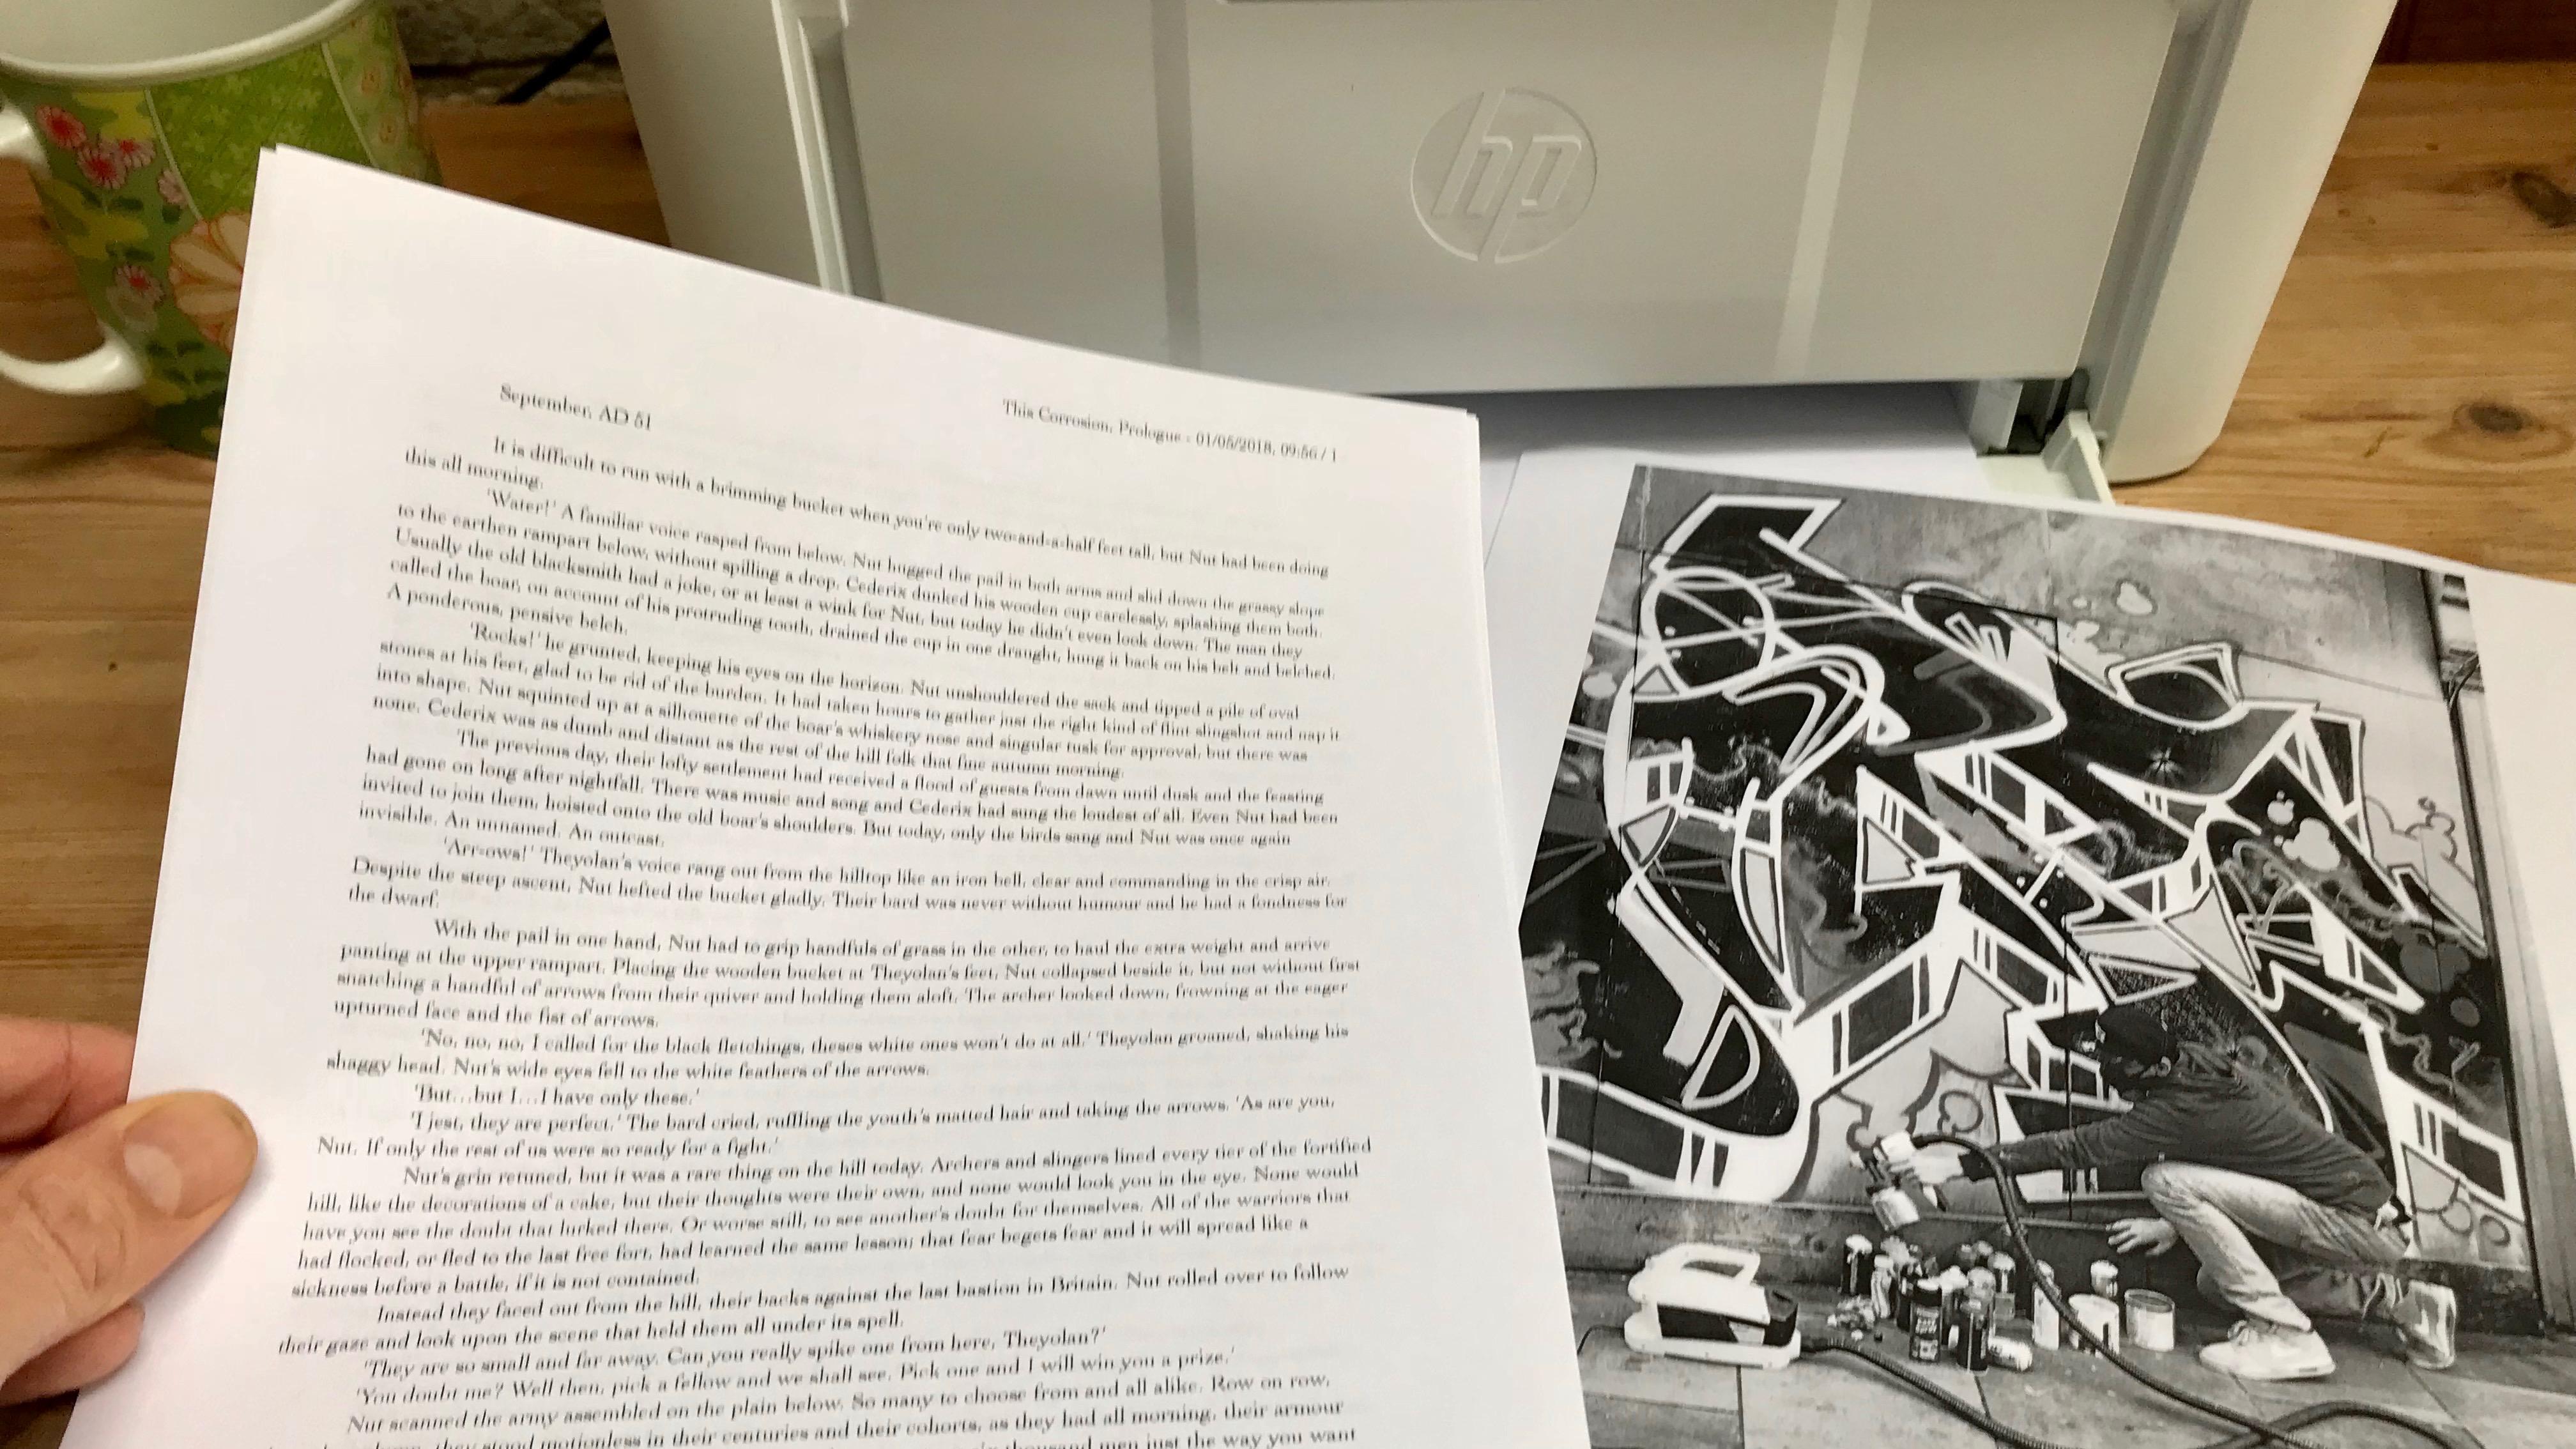 HP LaserJet Pro M15w photographs